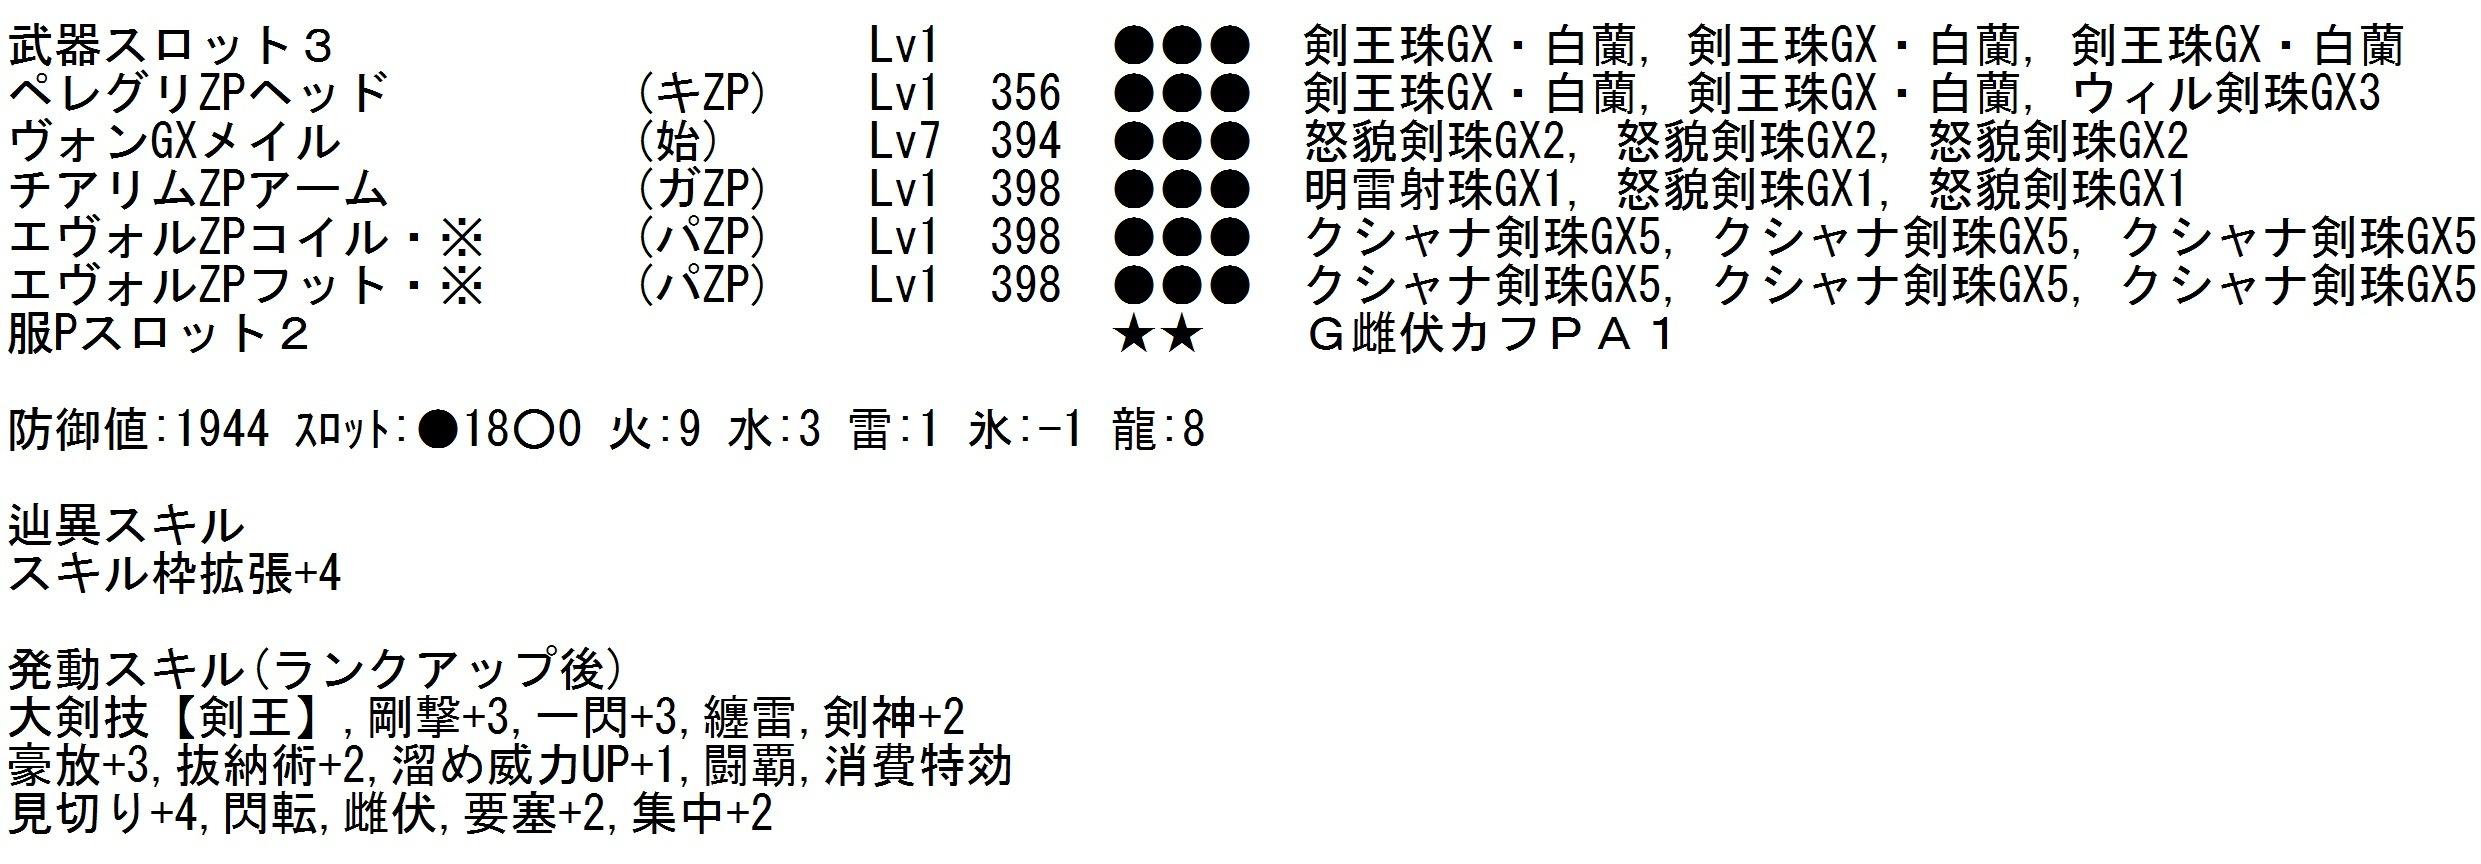 201701210353290dc.png